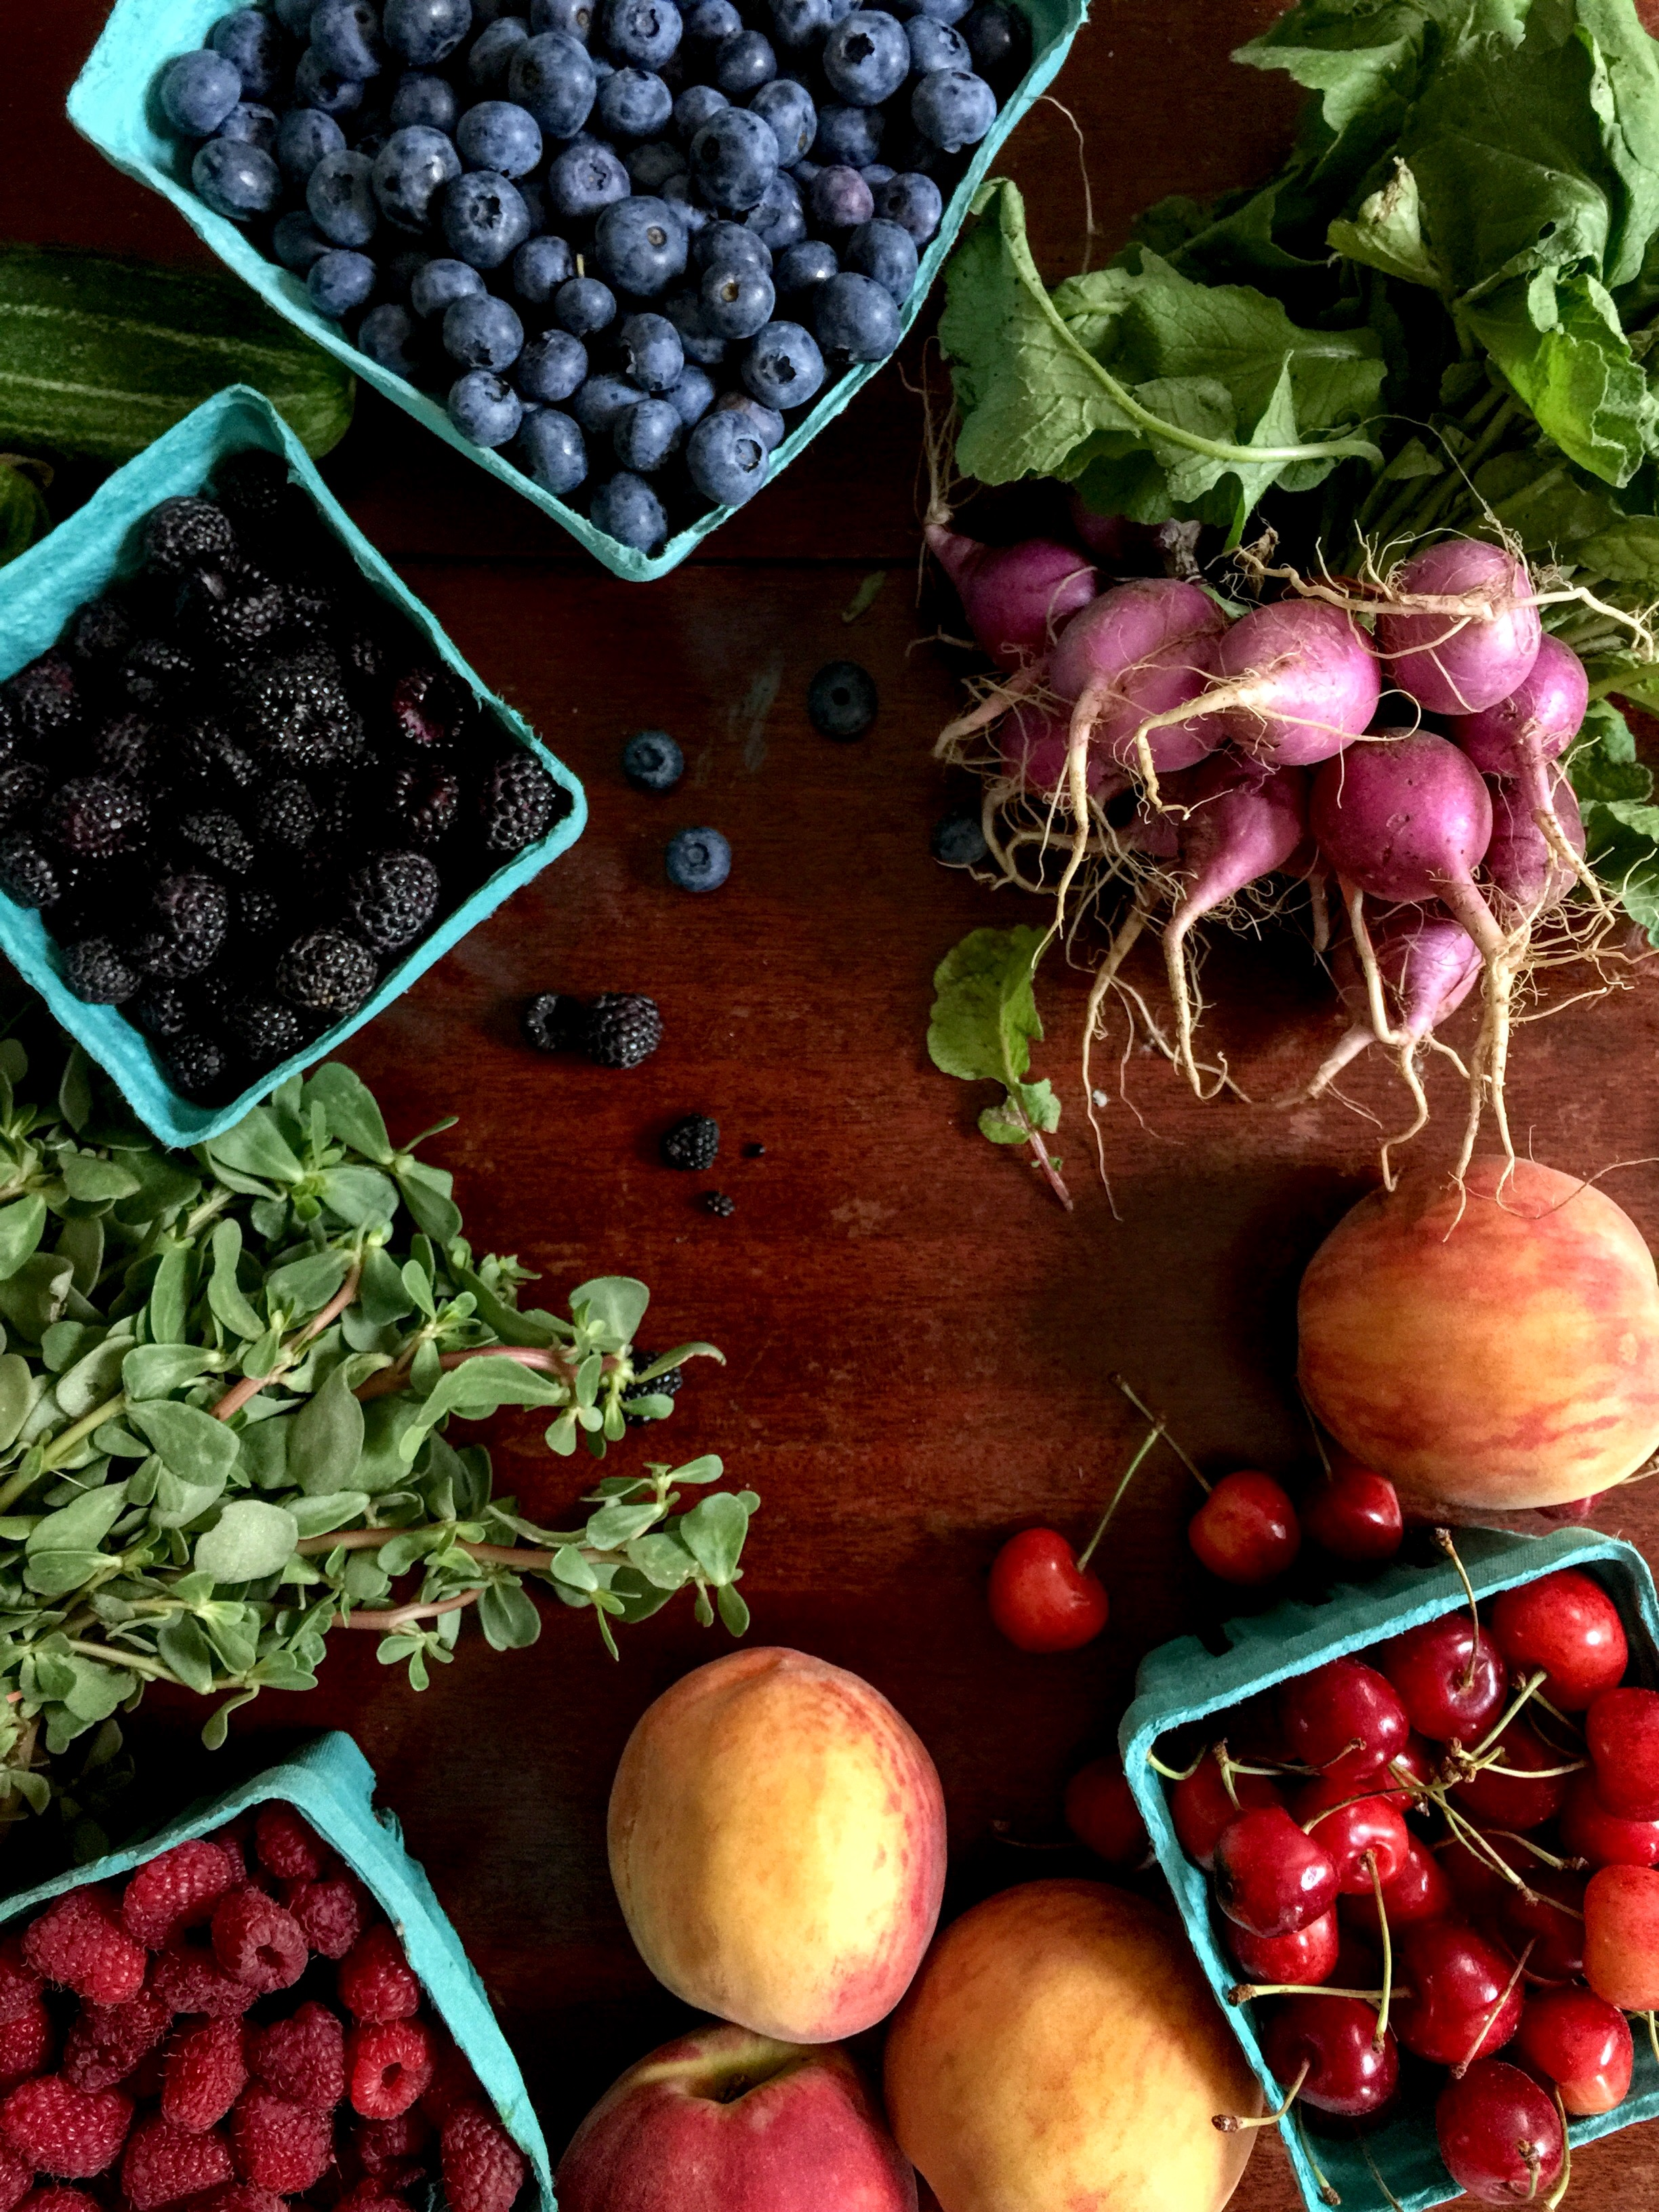 ROSE & IVY Journal On Food The ROSE & IVY Journal Food Philosophy